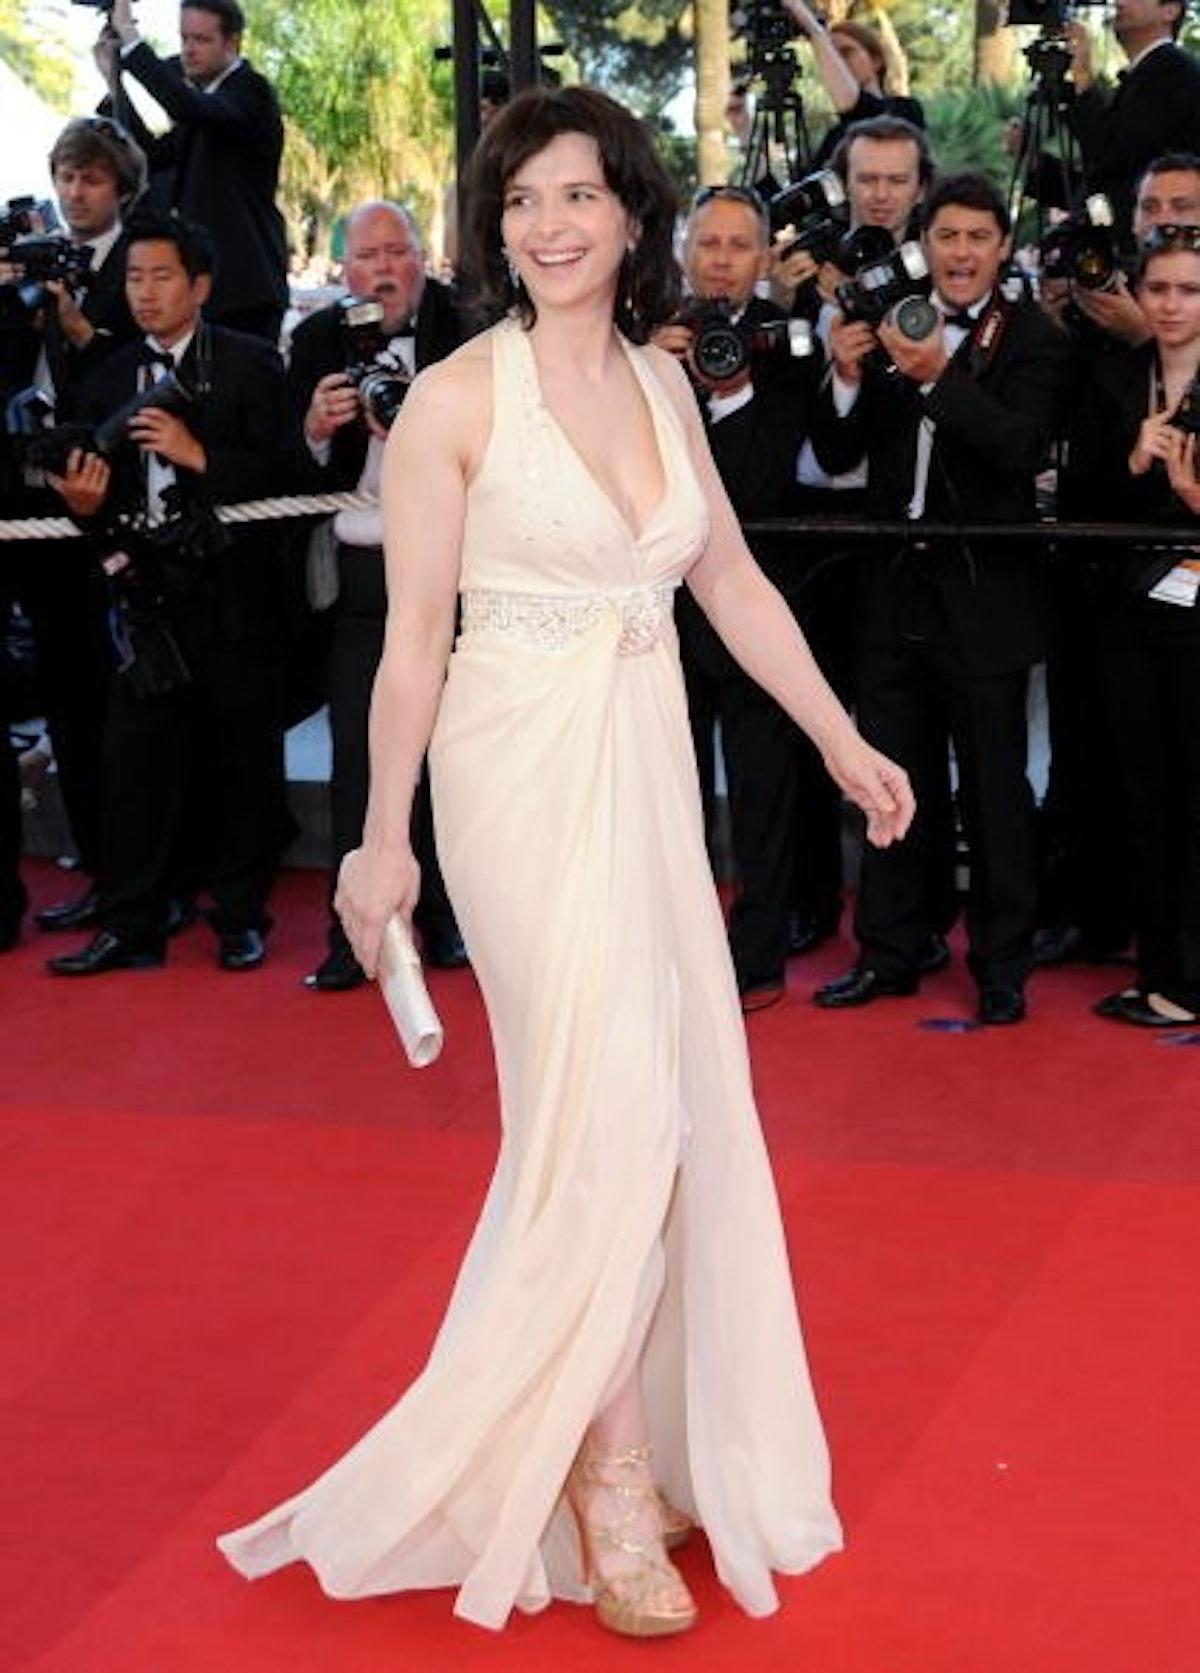 62nd Annual Cannes Film Festival - A Prophet Premiere